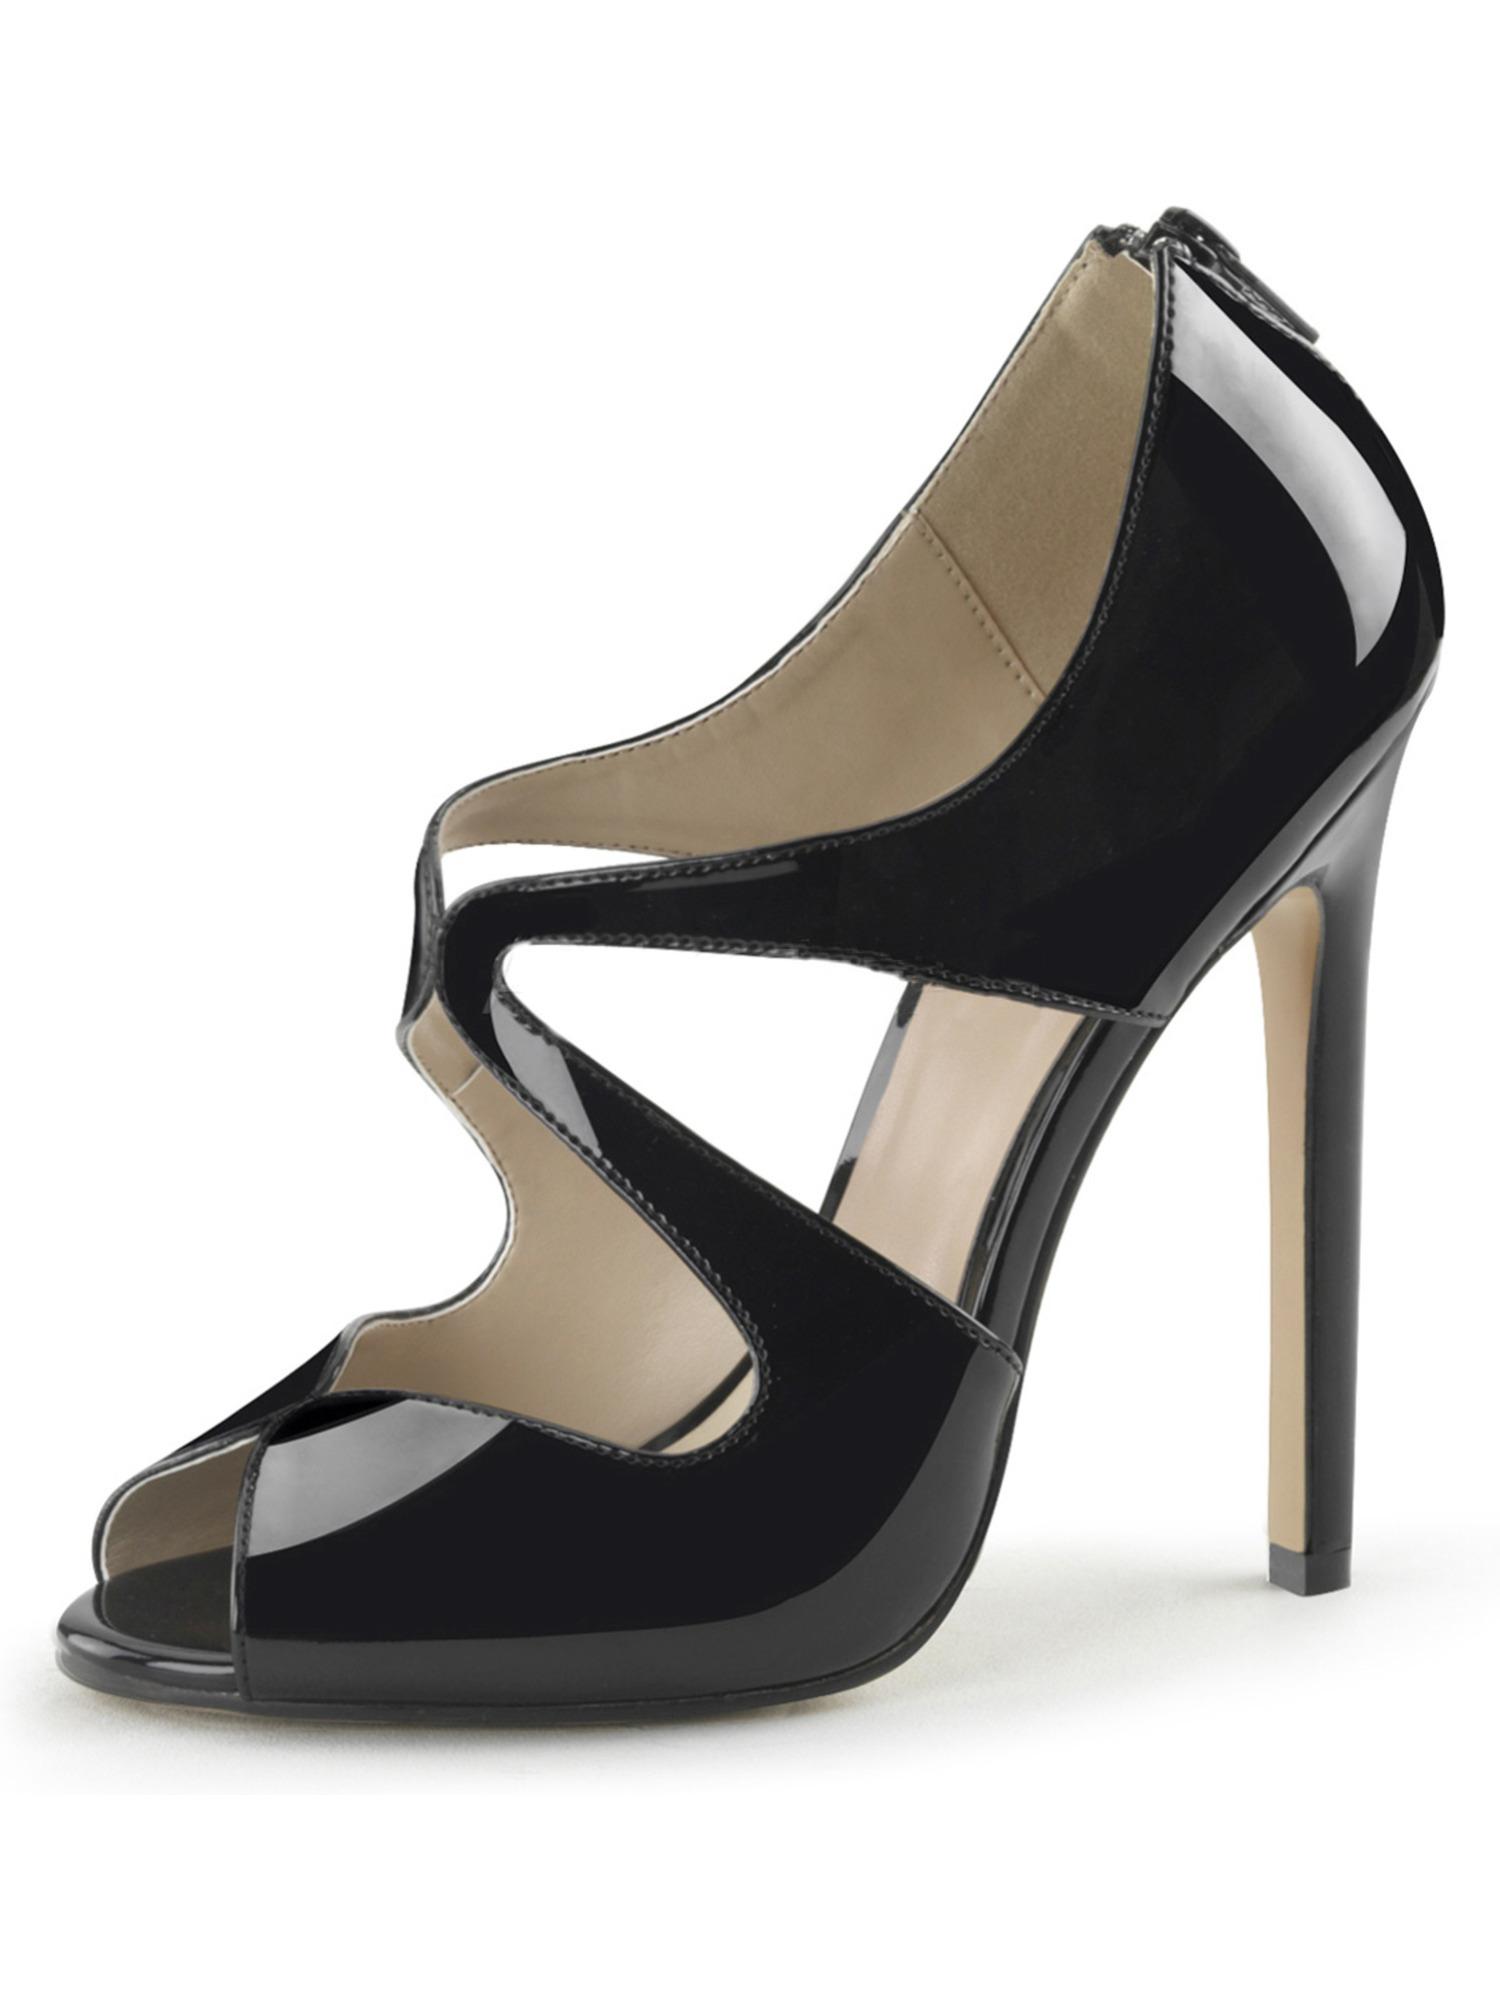 Womens Stiletto High Heels Black Peep Toe Pump Cut Outs Sandals 5 Inch Heels